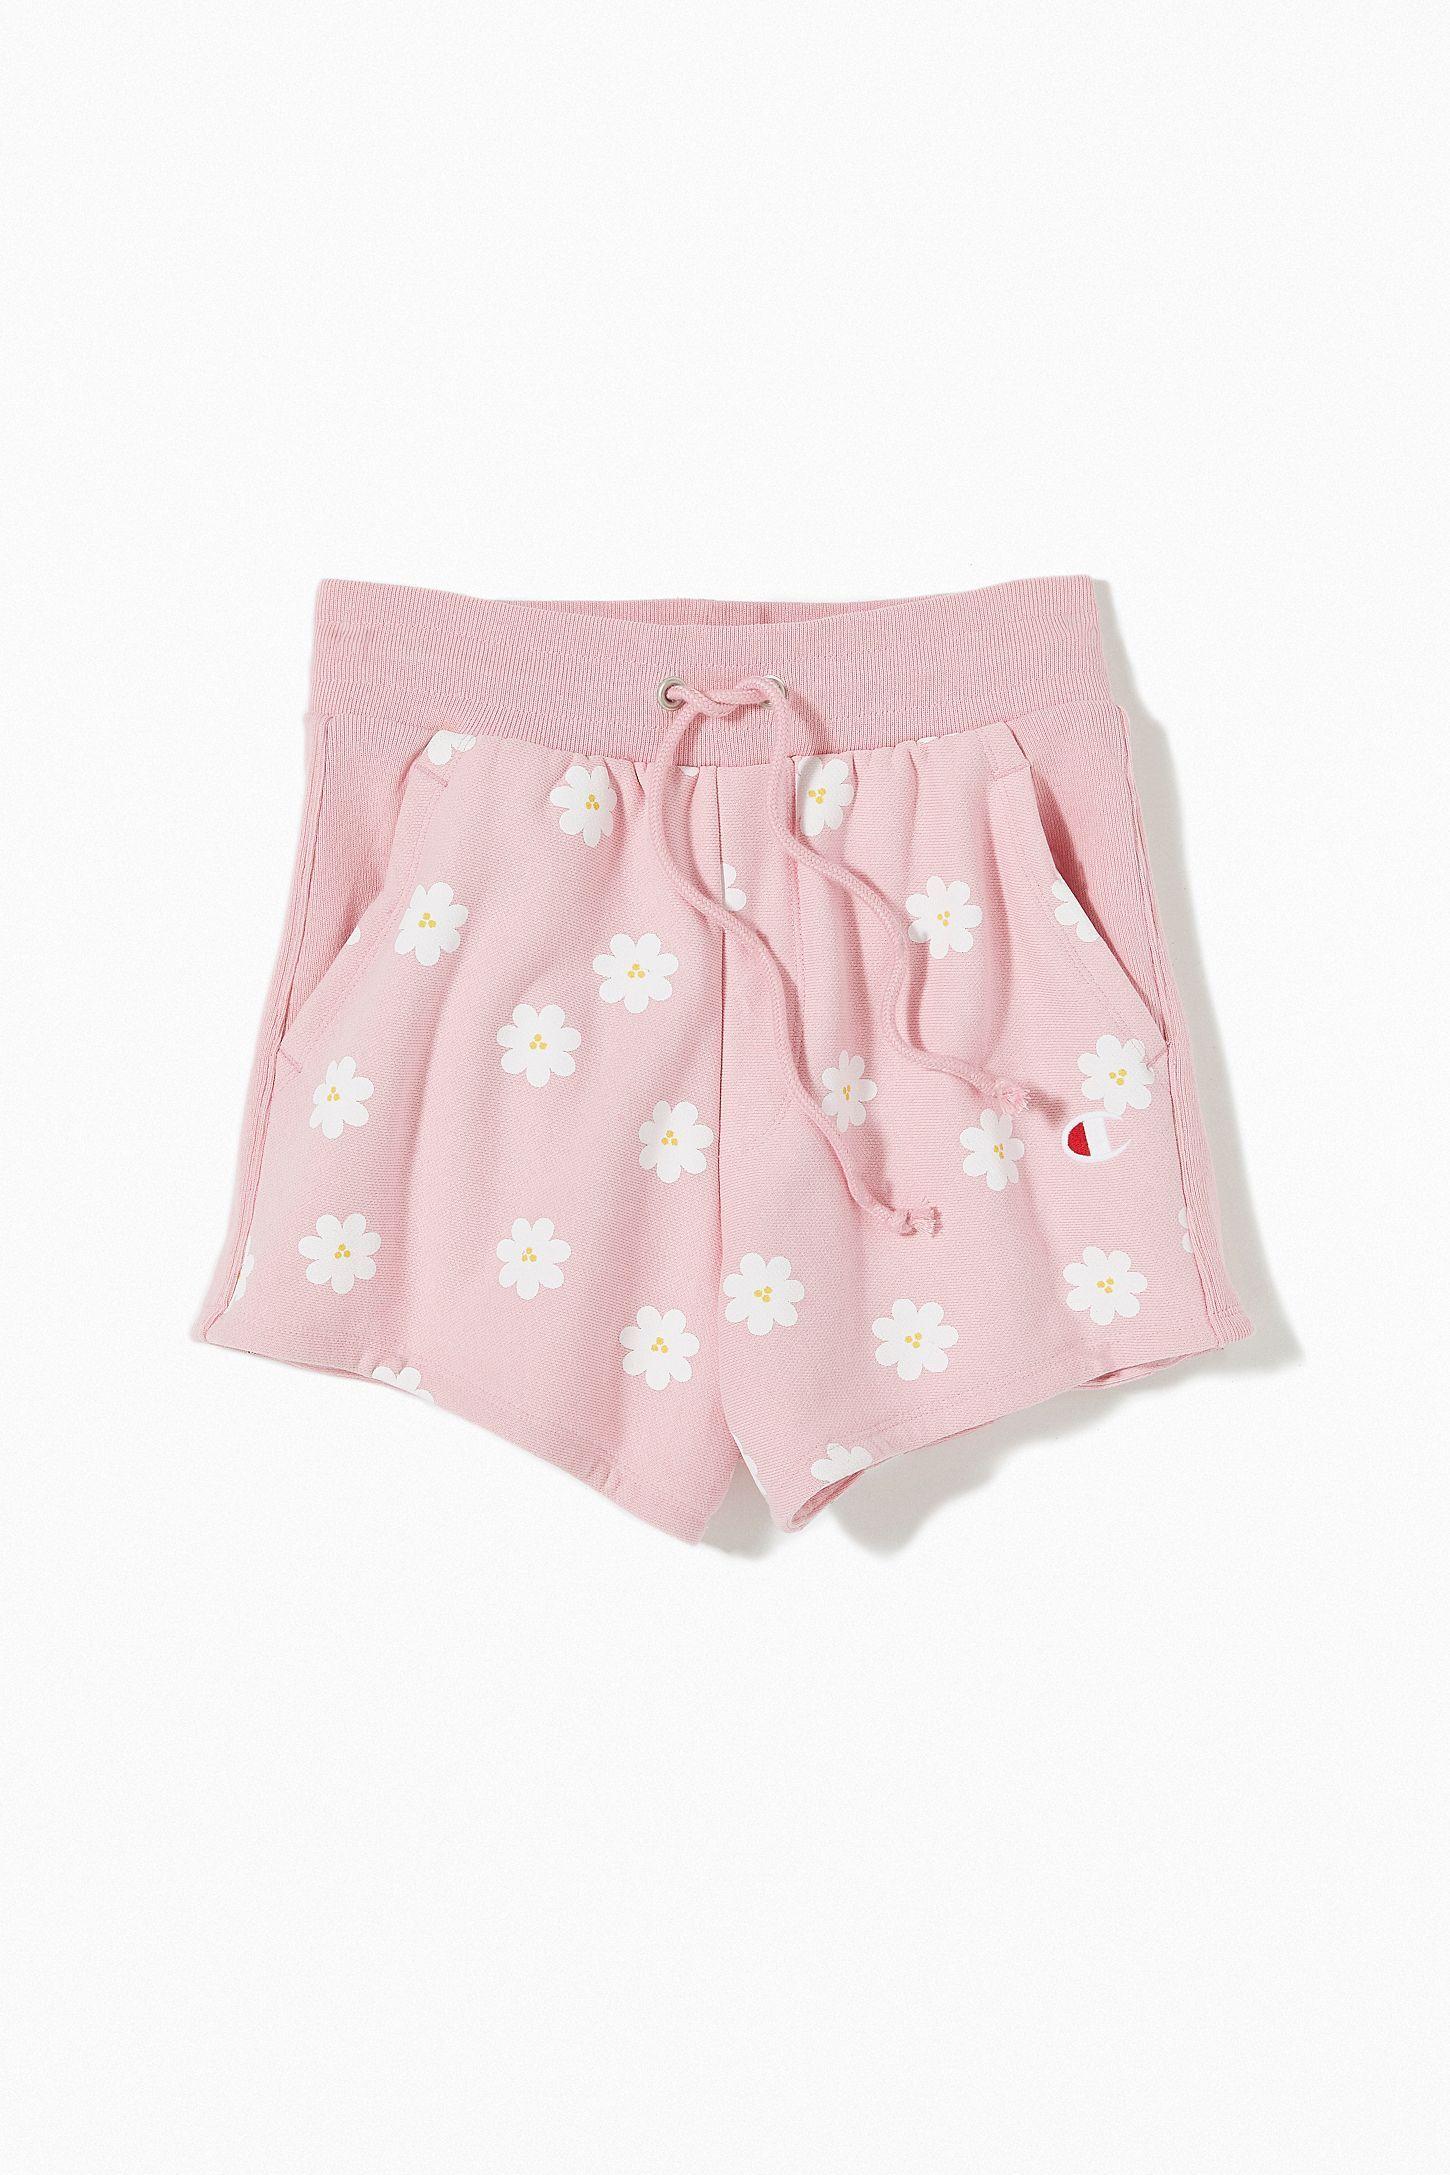 Champion Uo Exclusive Daisy Short Urban Outfitters Daisy Shorts Urban Outfitters Fashion [ 2175 x 1450 Pixel ]